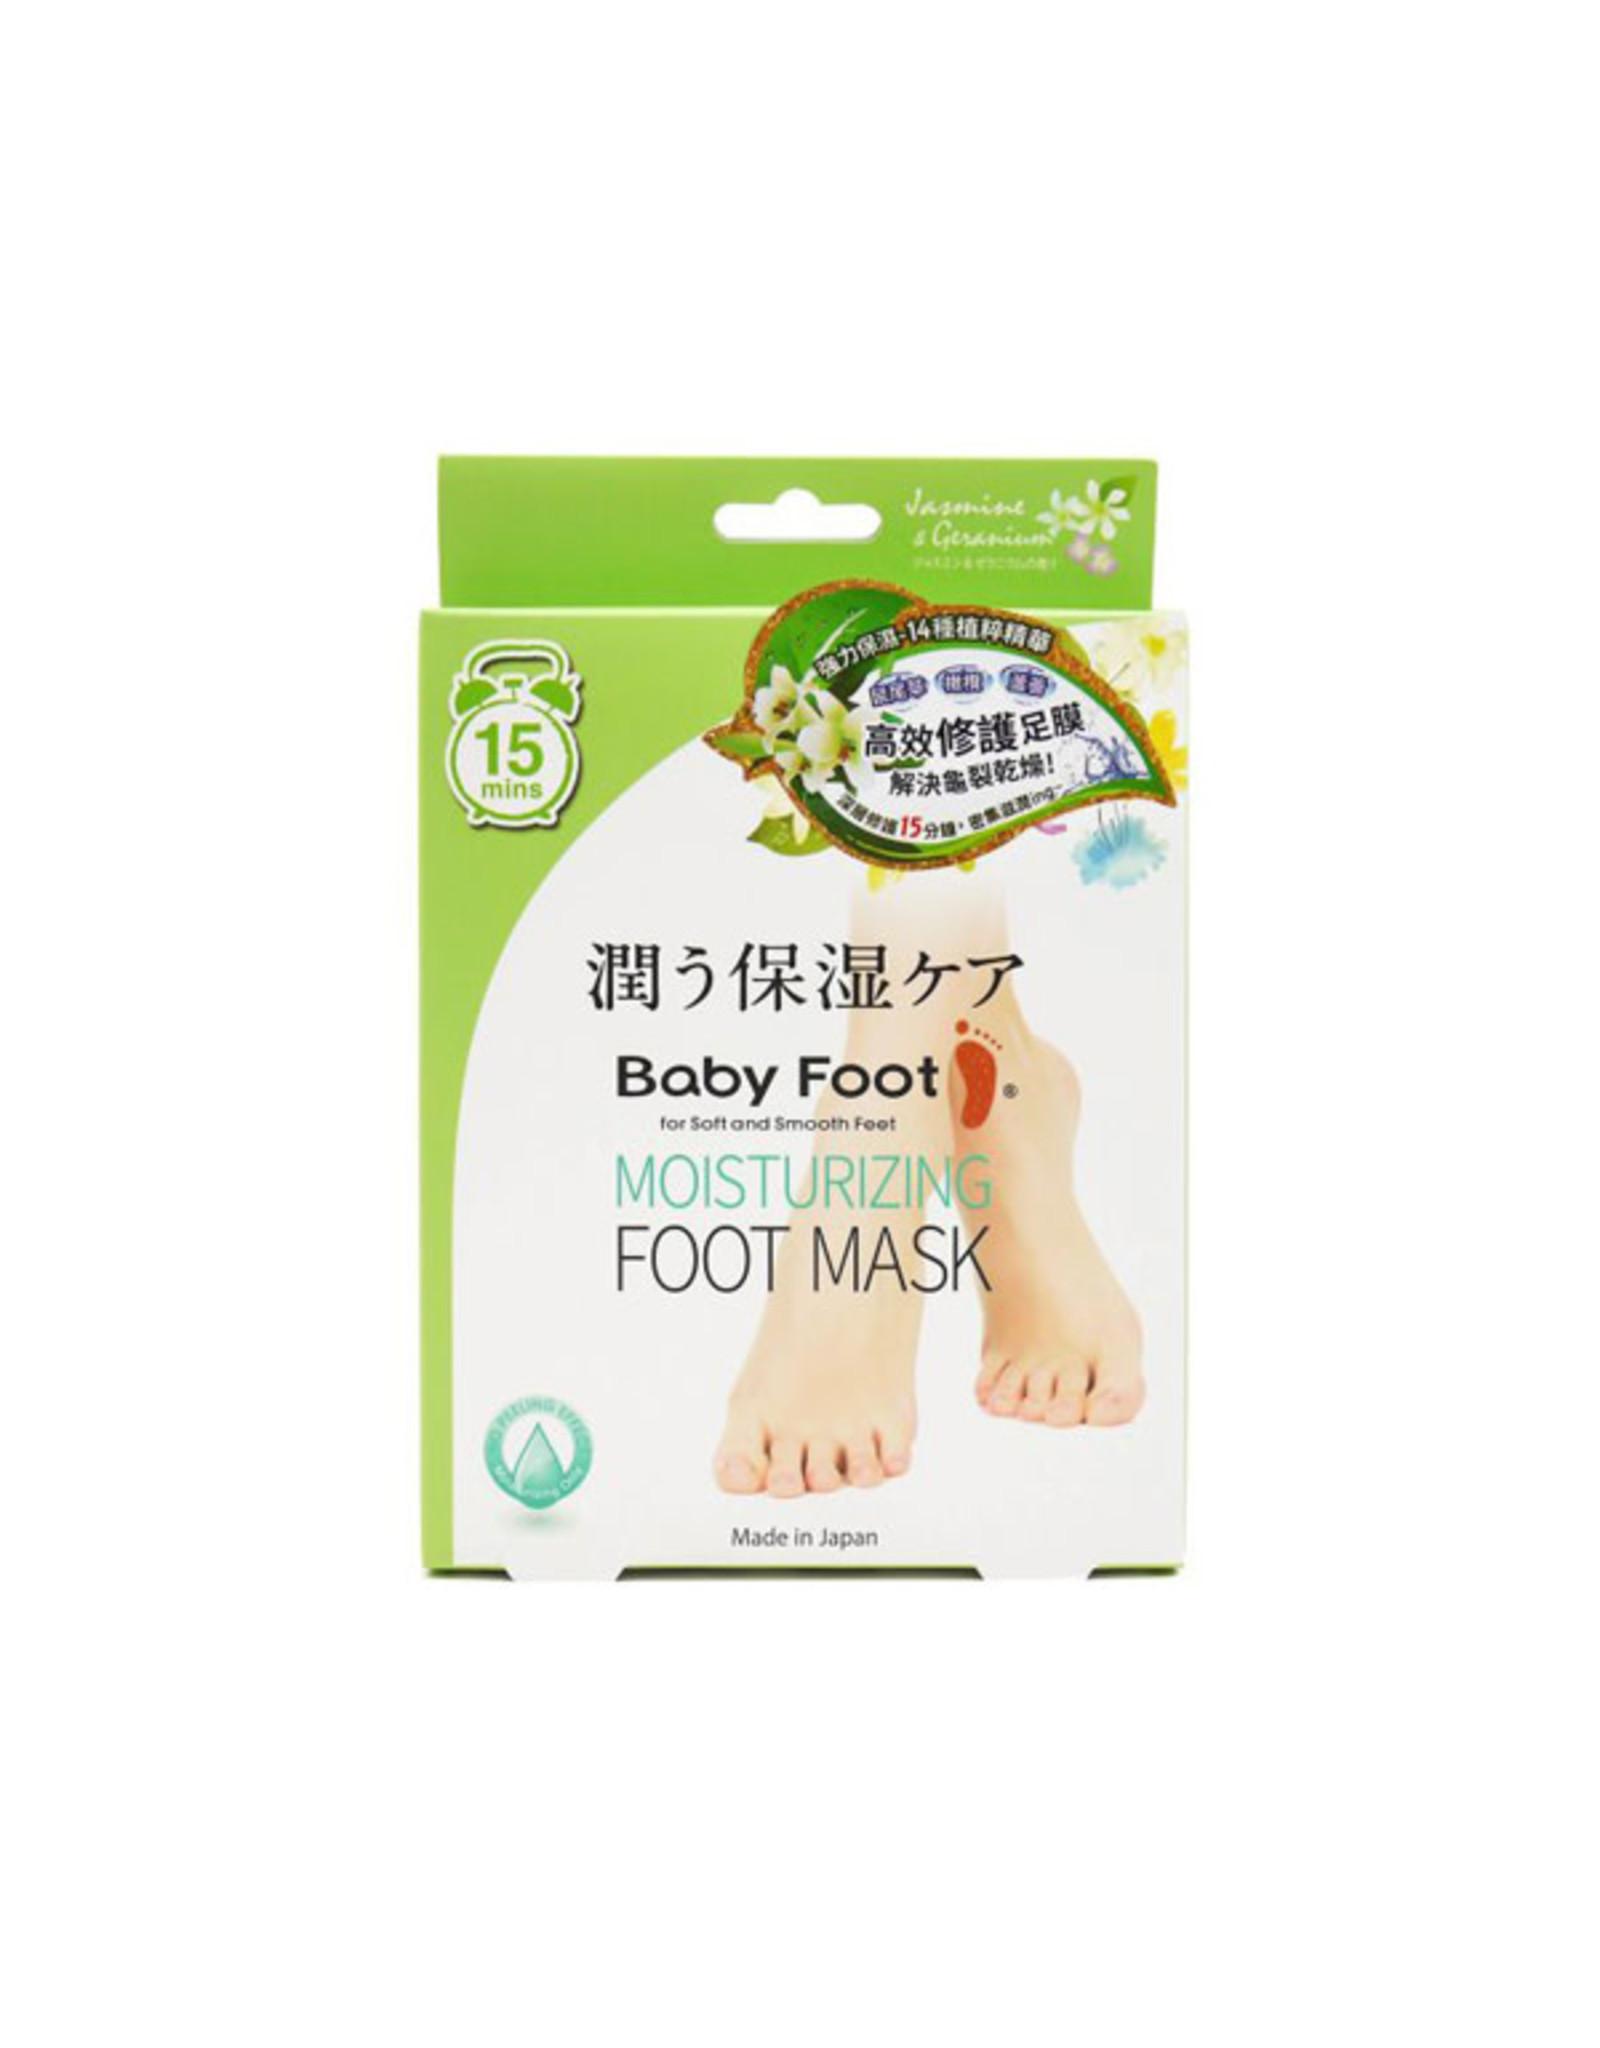 Liberta Baby Foot Moist Foot Mask Asia